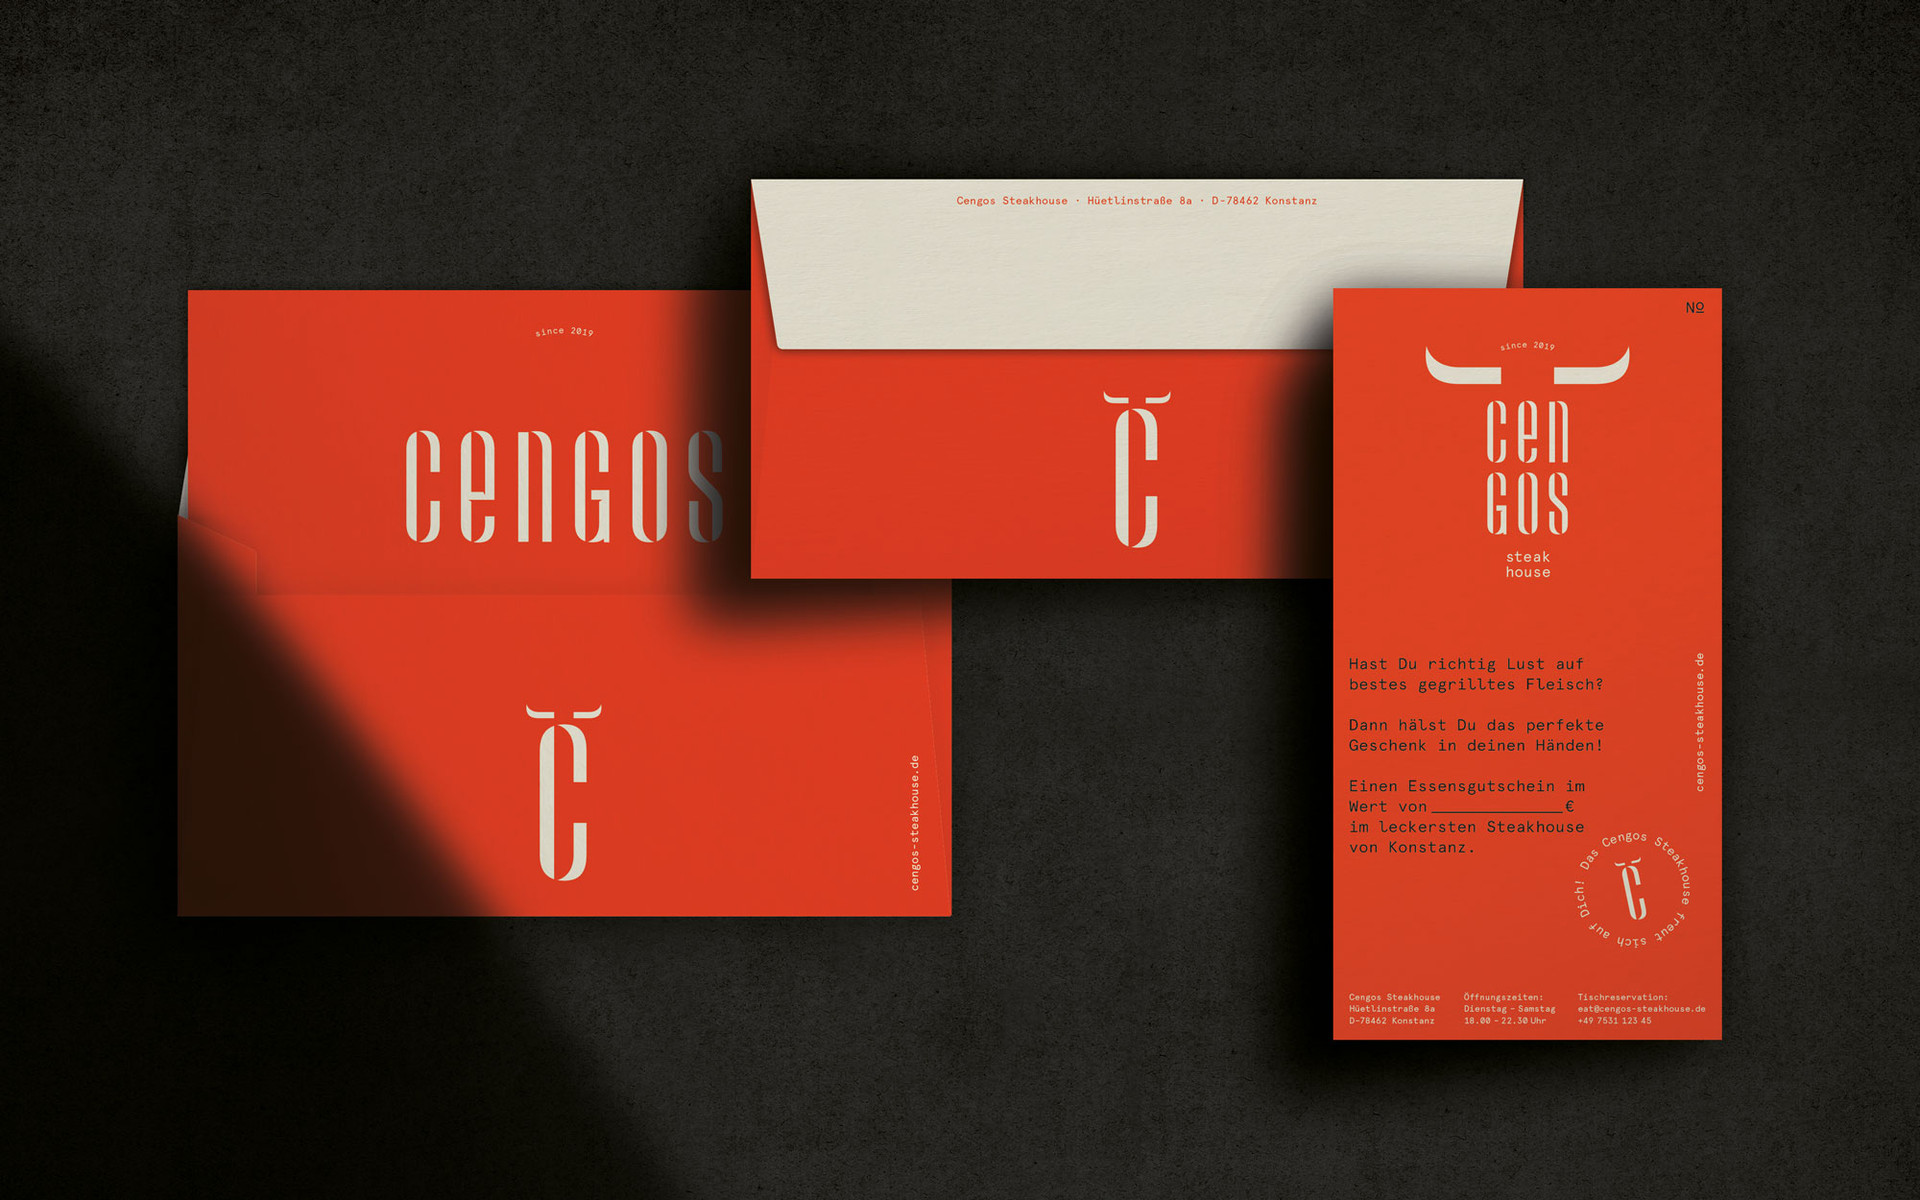 Cengos_09.jpg